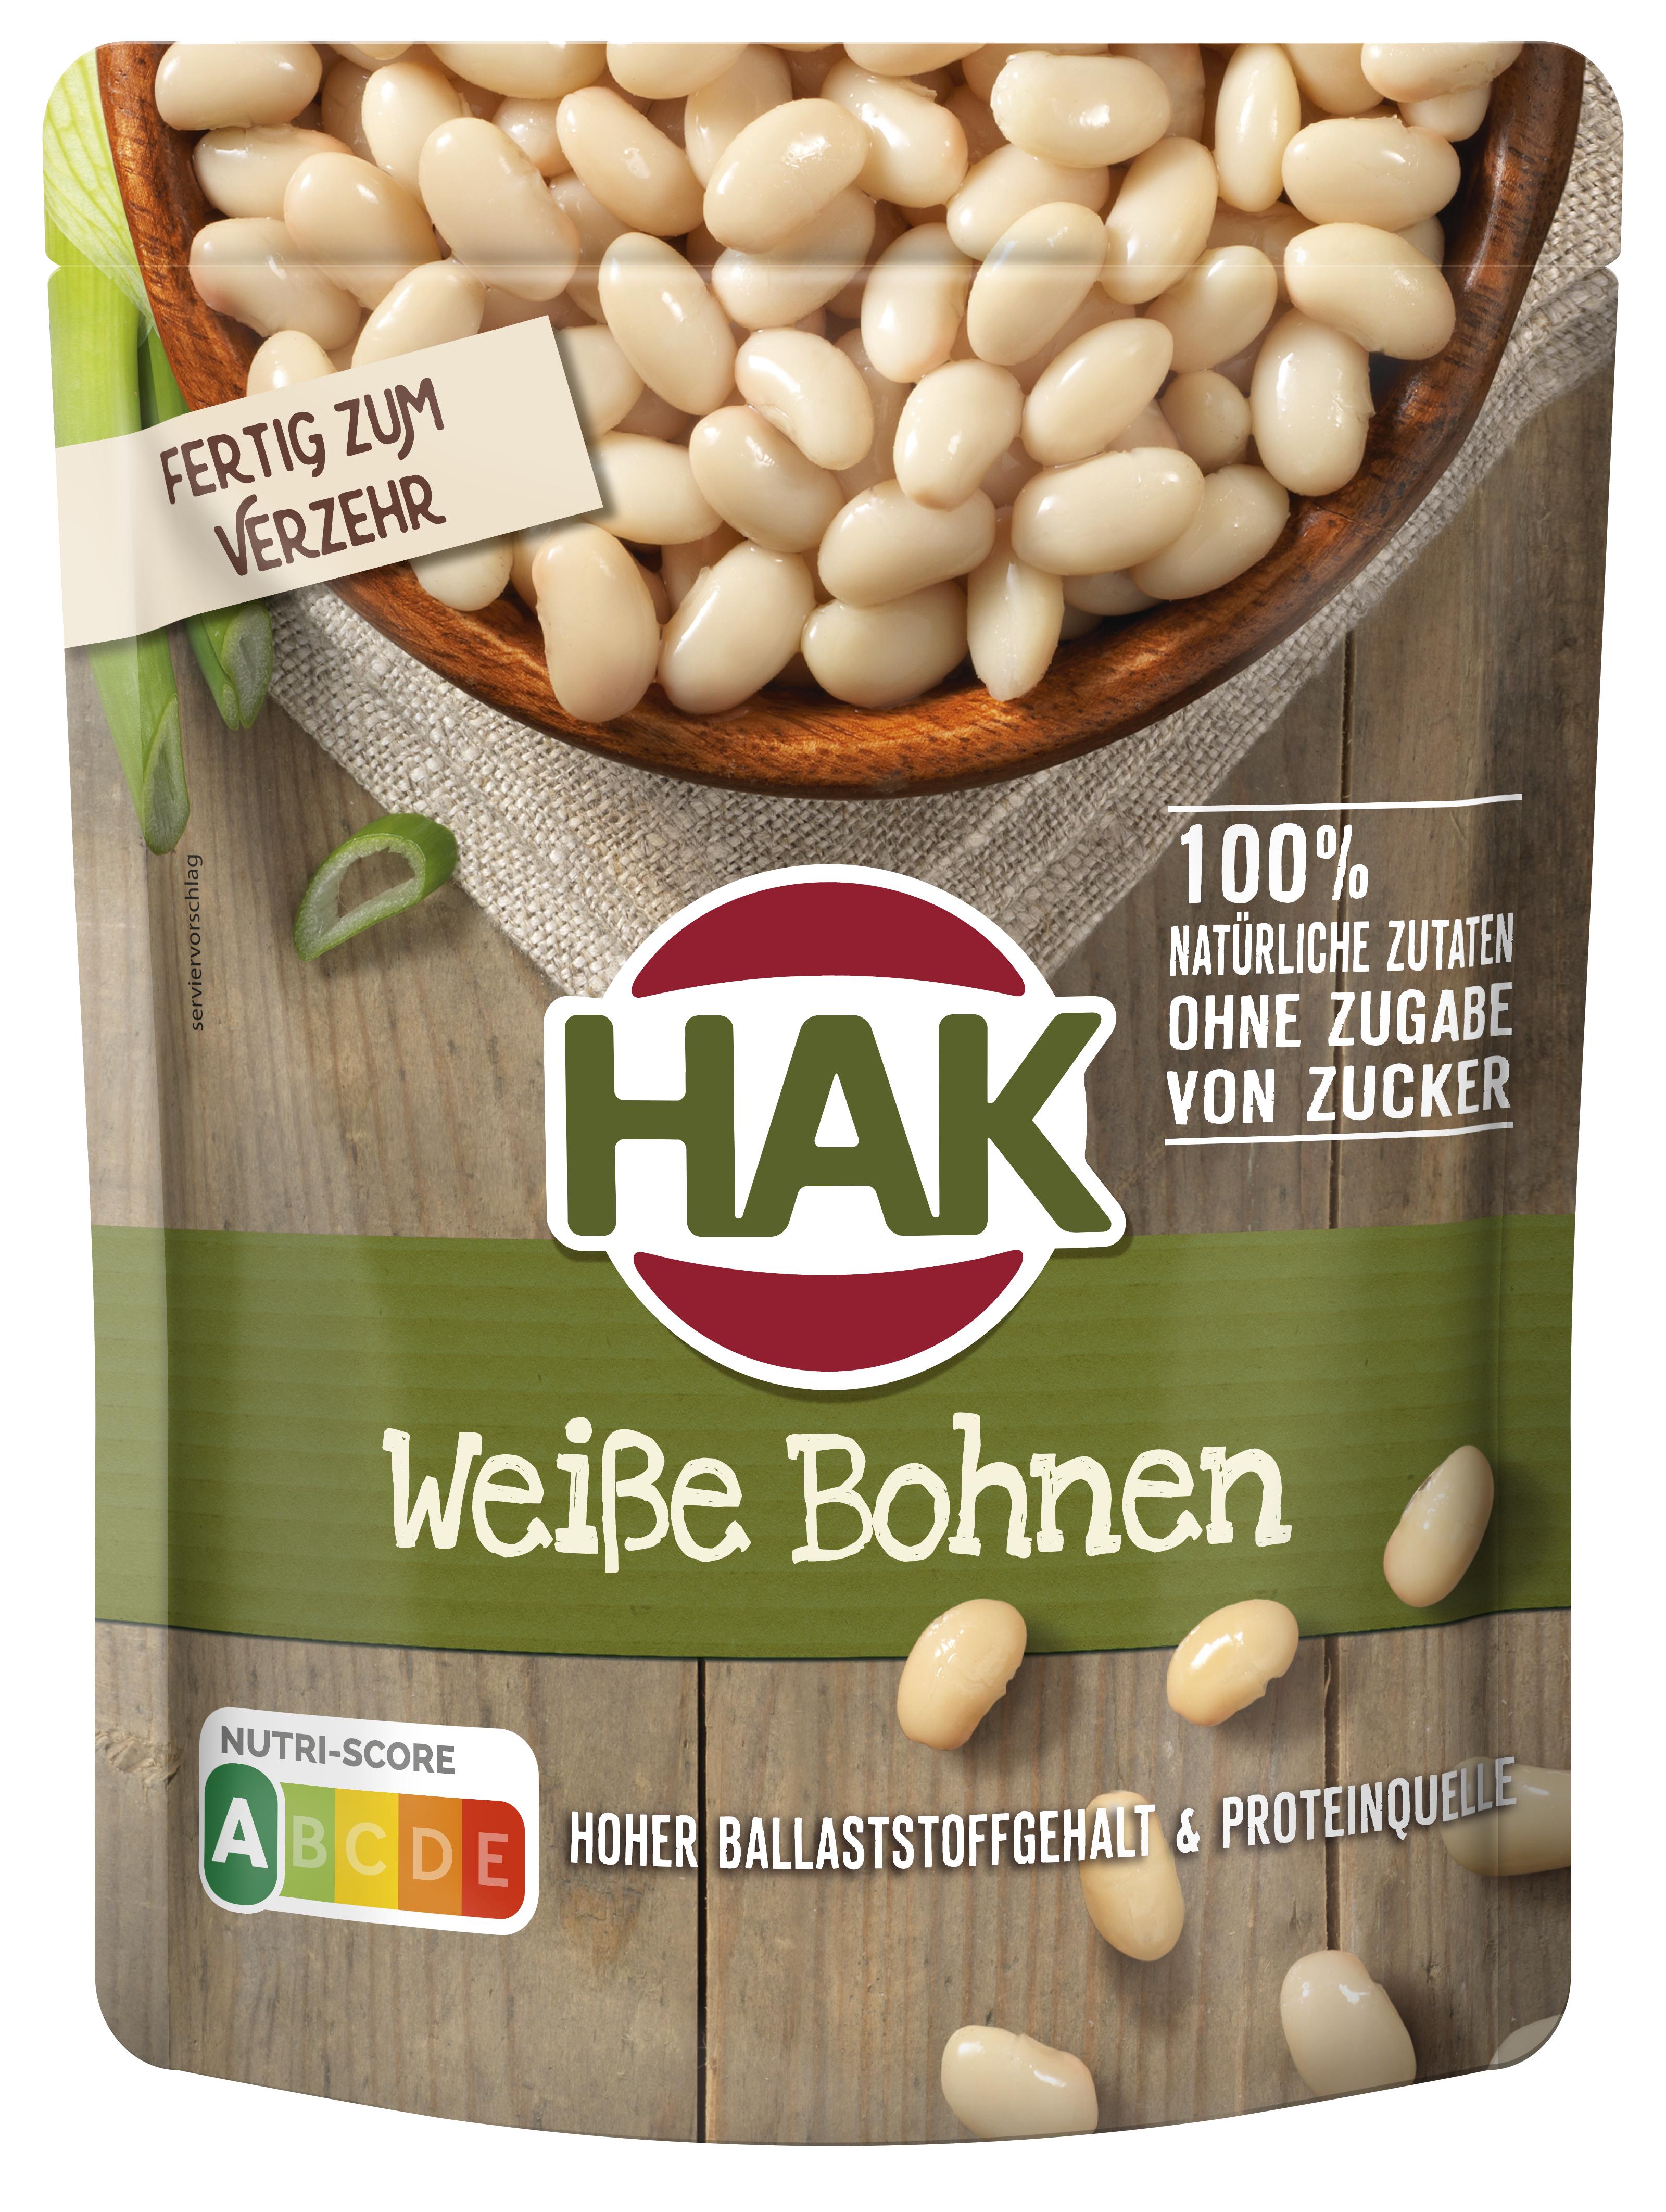 HAK Weisse Bohnen 08720600618918 C1 N1 s01png